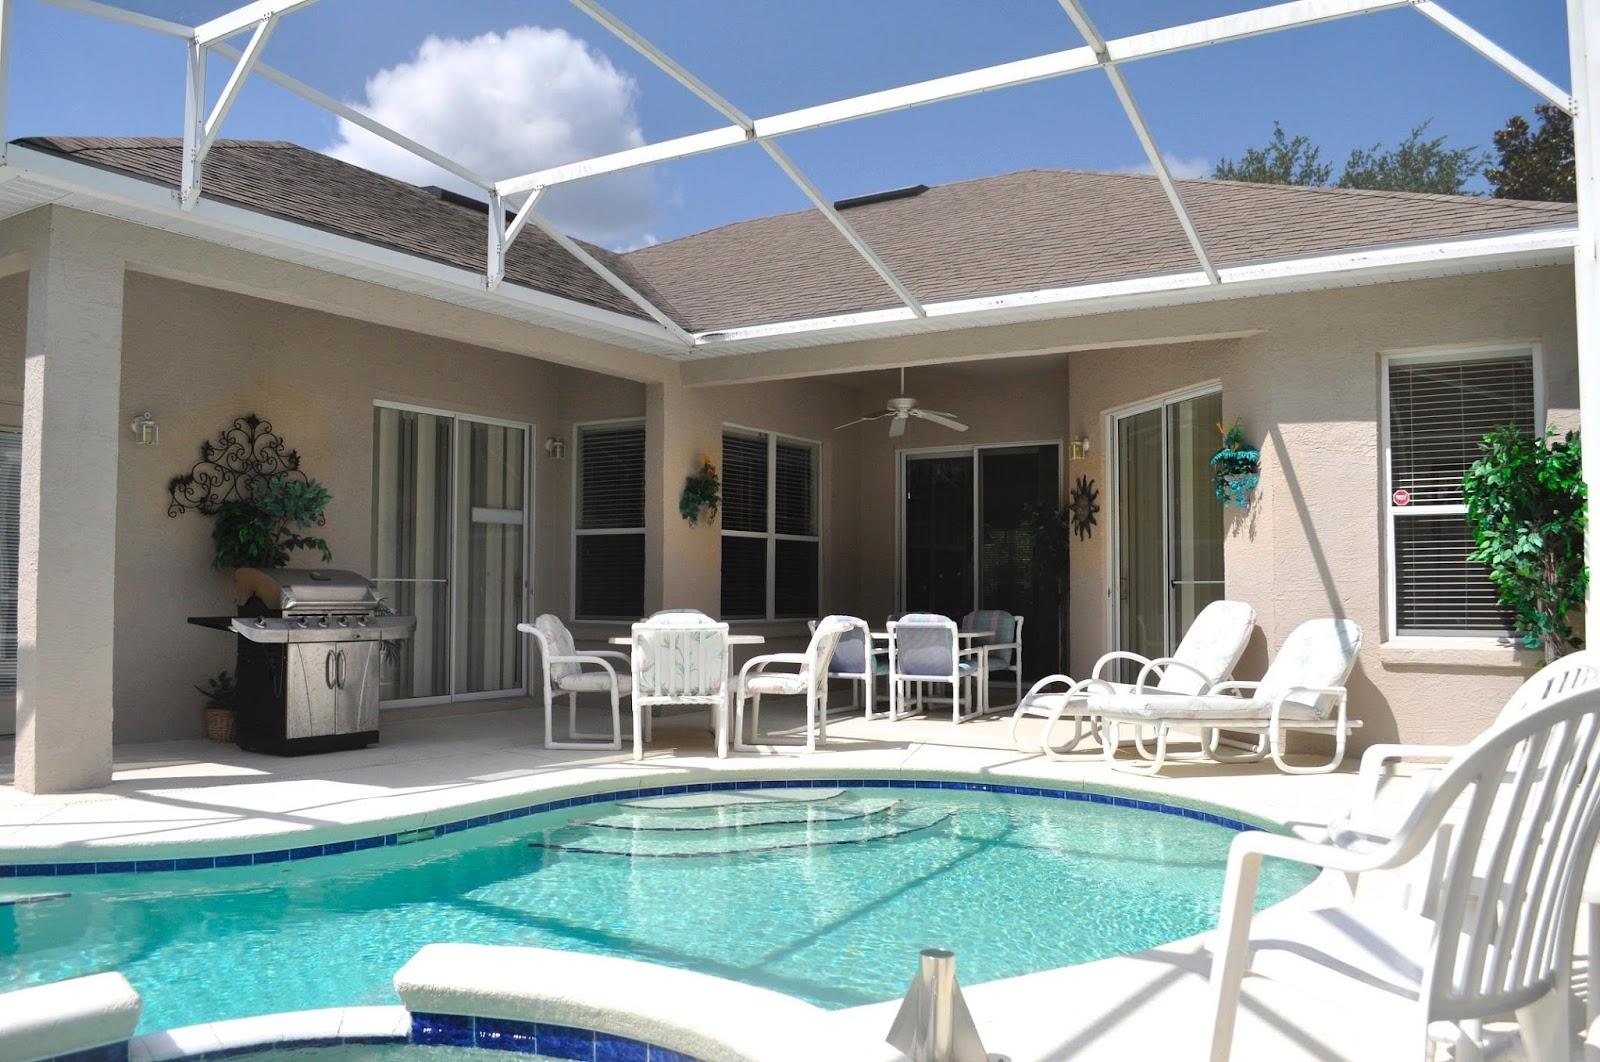 2 Bedroom Beach Resorts In Florida